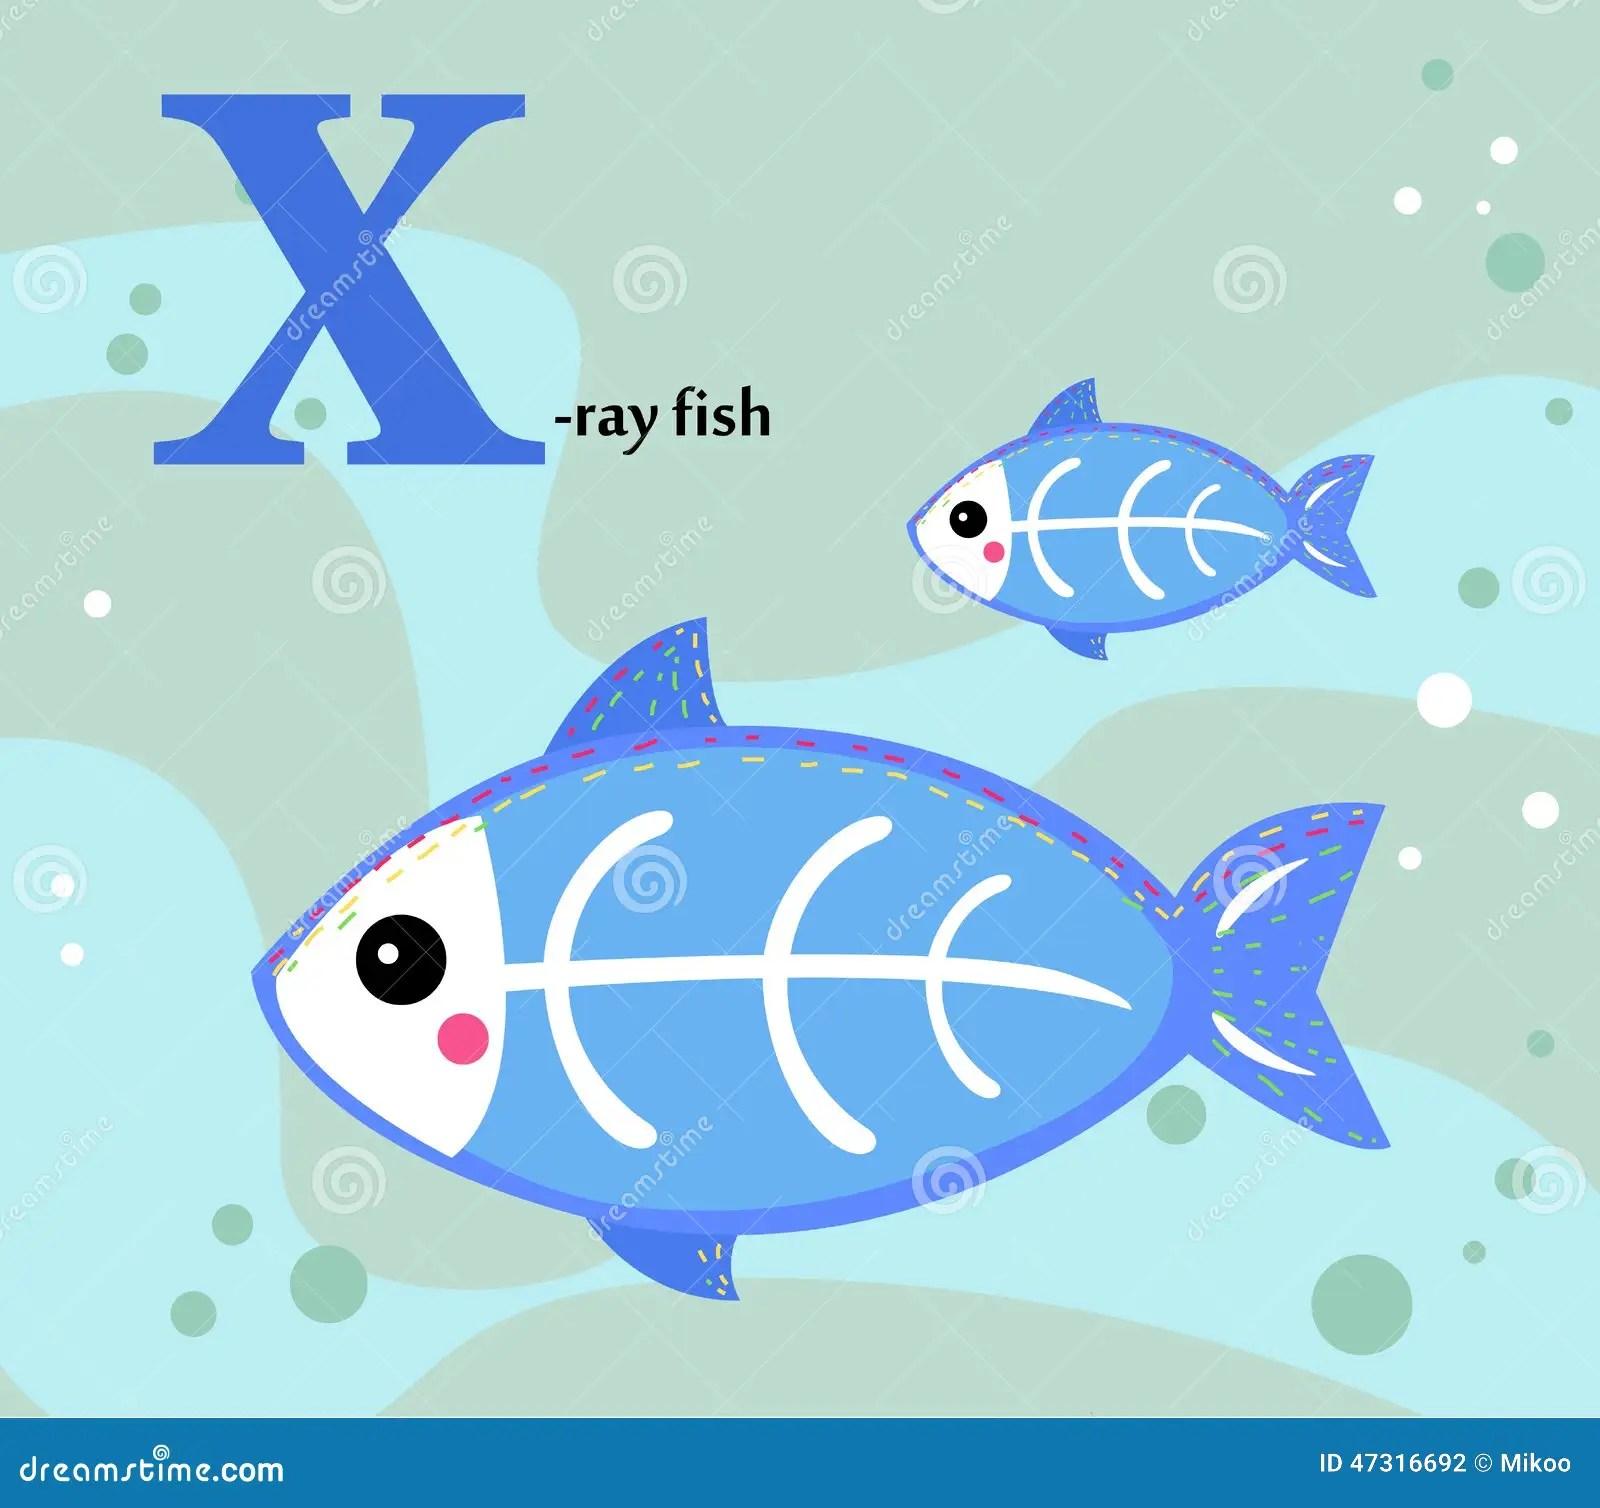 Animal Alphabet X X Ray Fish Vector Illustration